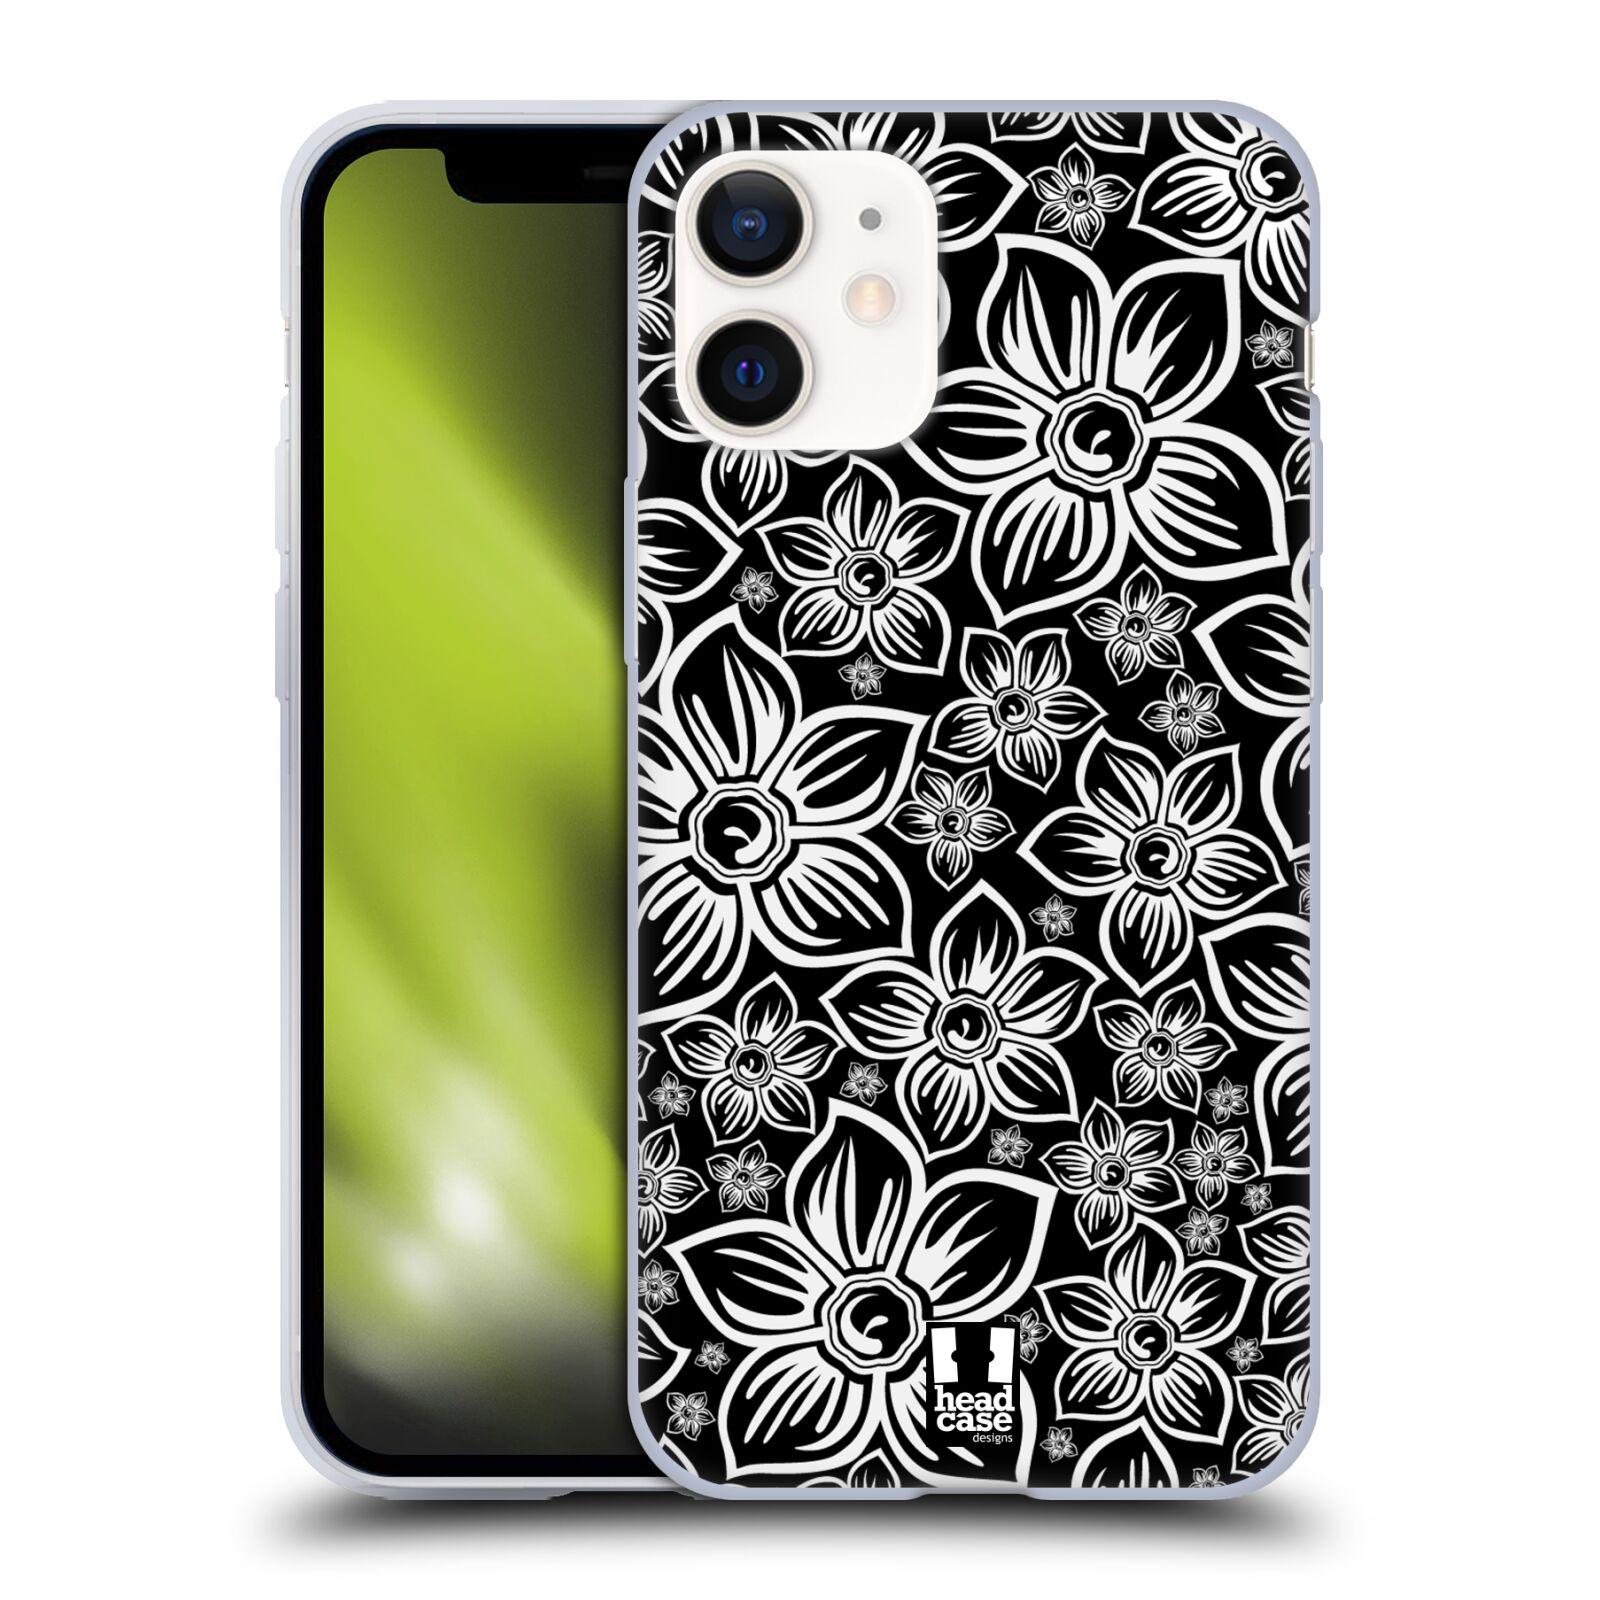 Silikonové pouzdro na mobil Apple iPhone 12 Mini - Head Case - FLORAL DAISY